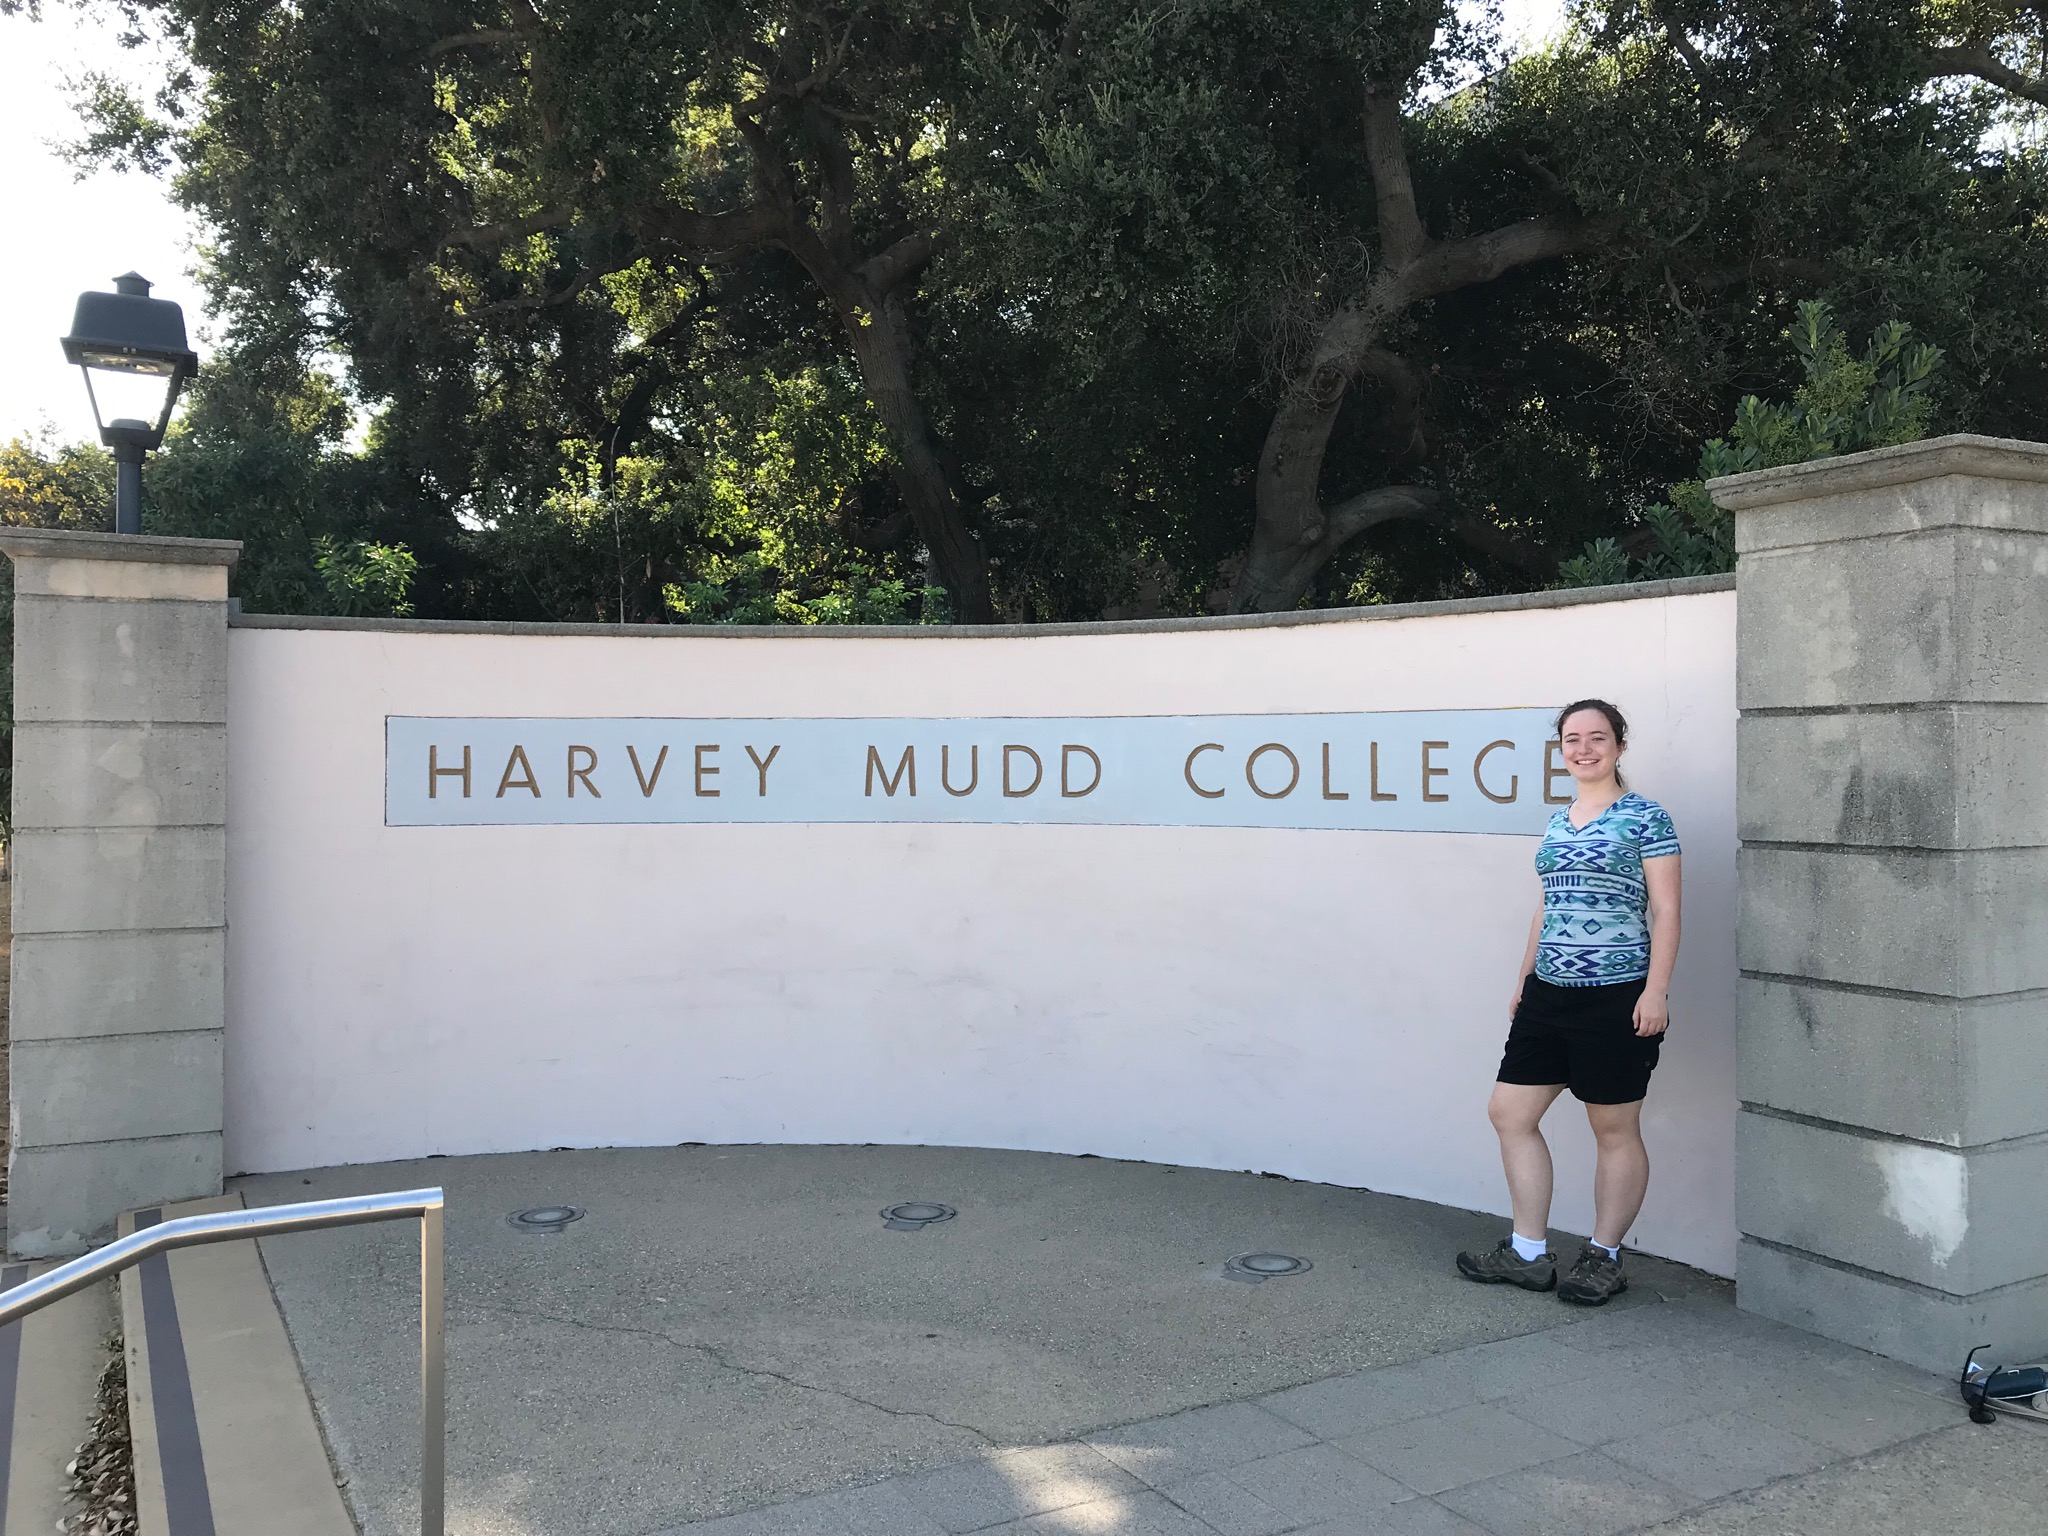 Malia in front of a Harvey Mudd College